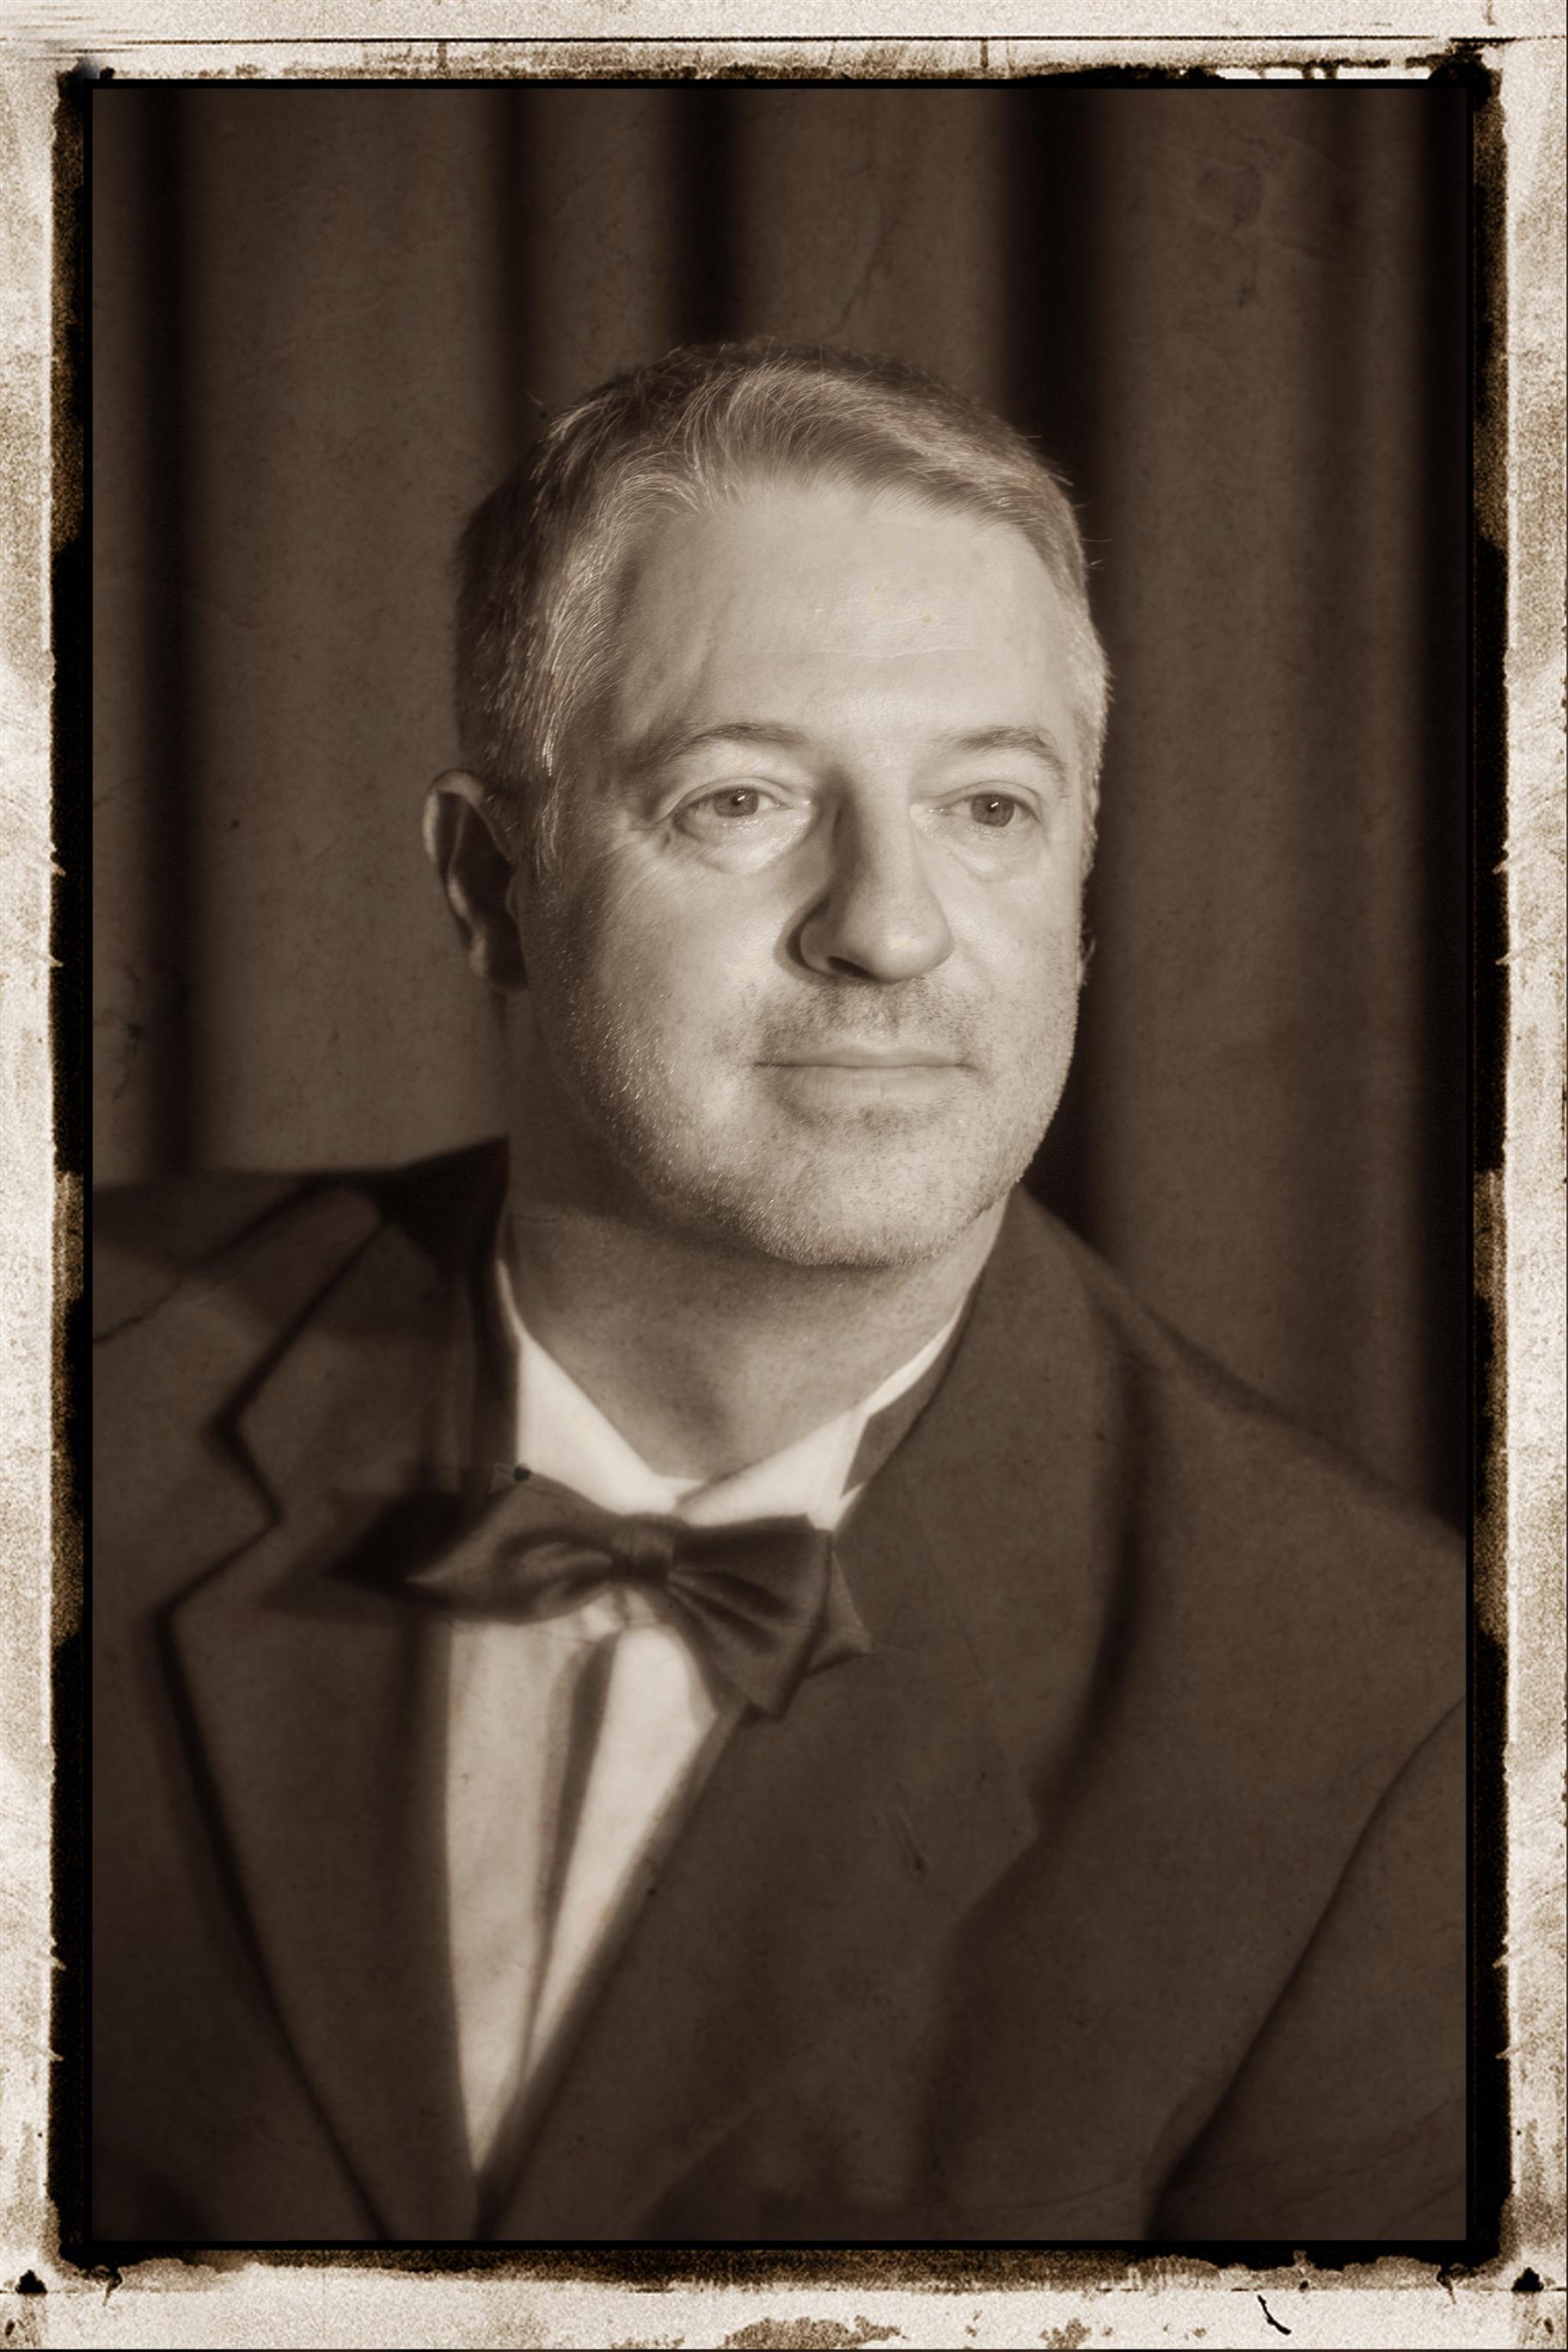 Ralf Stierle